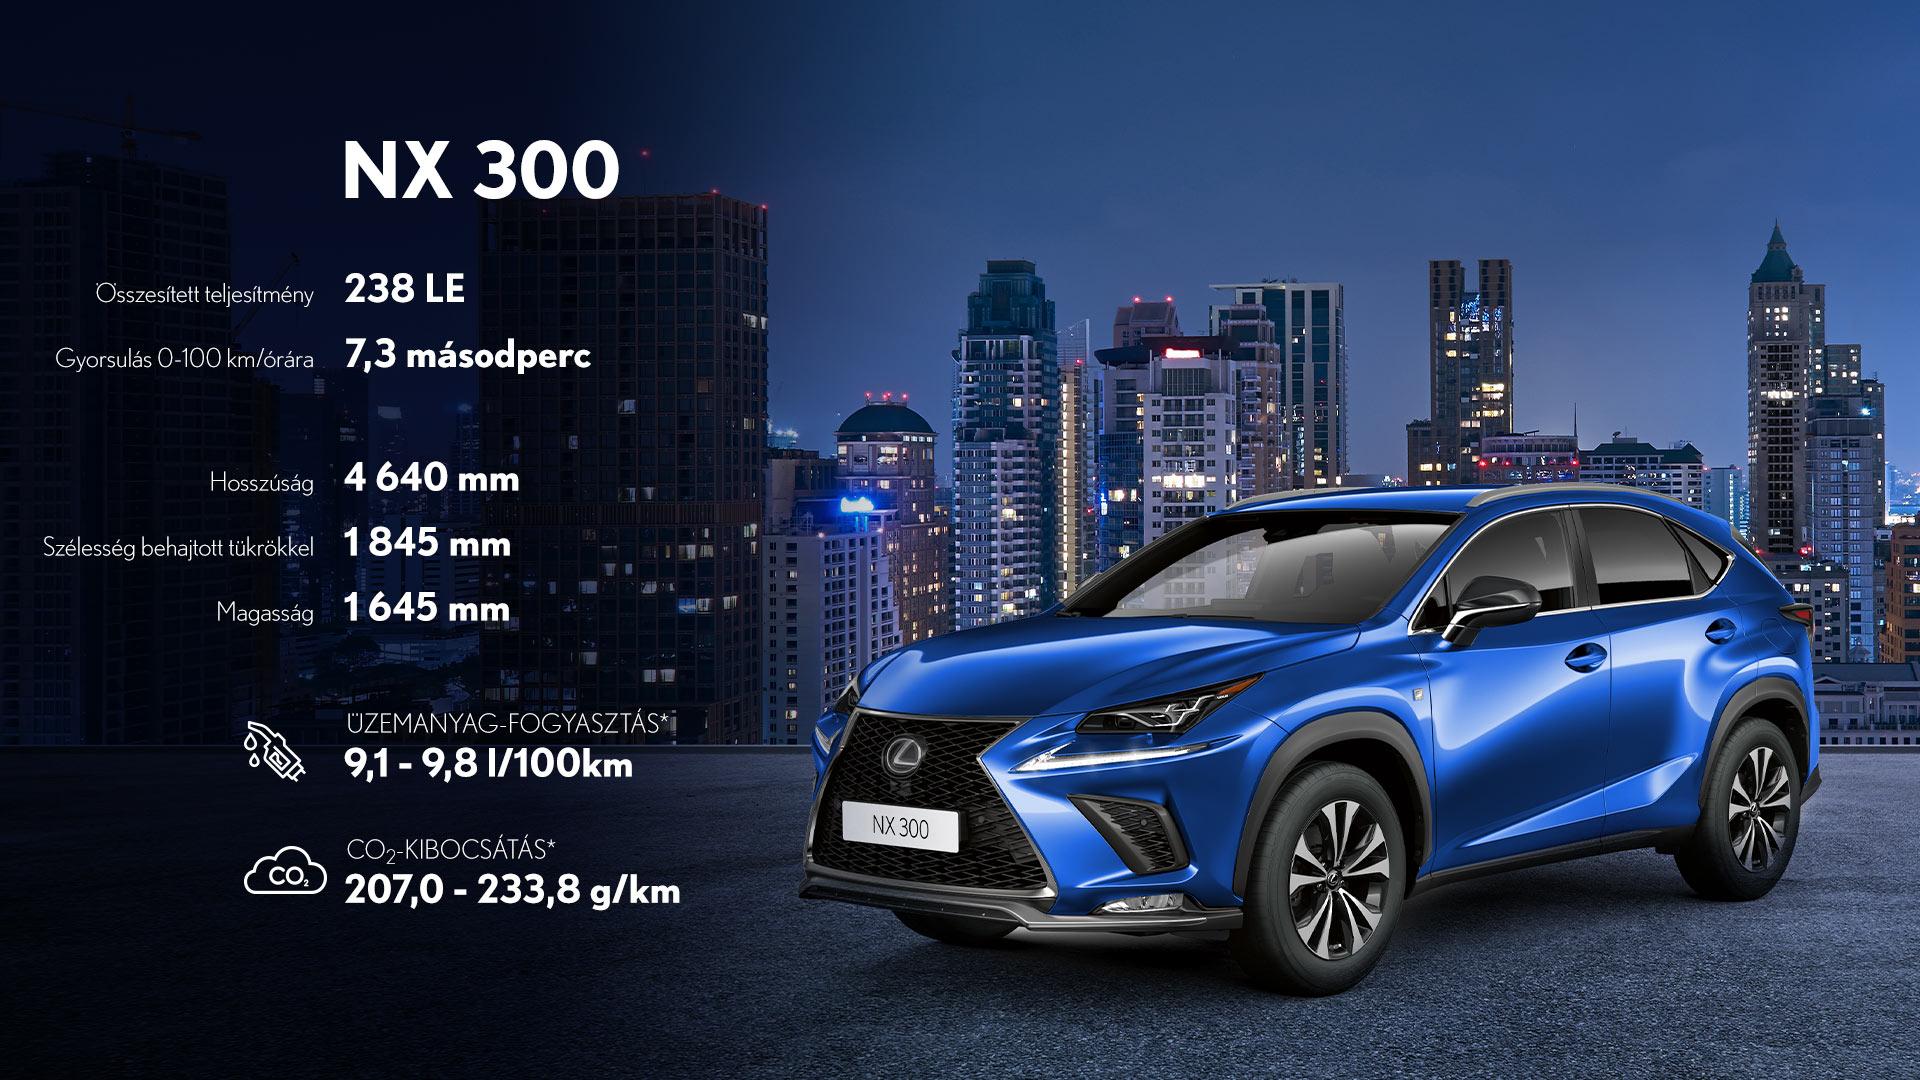 NX 300 spec